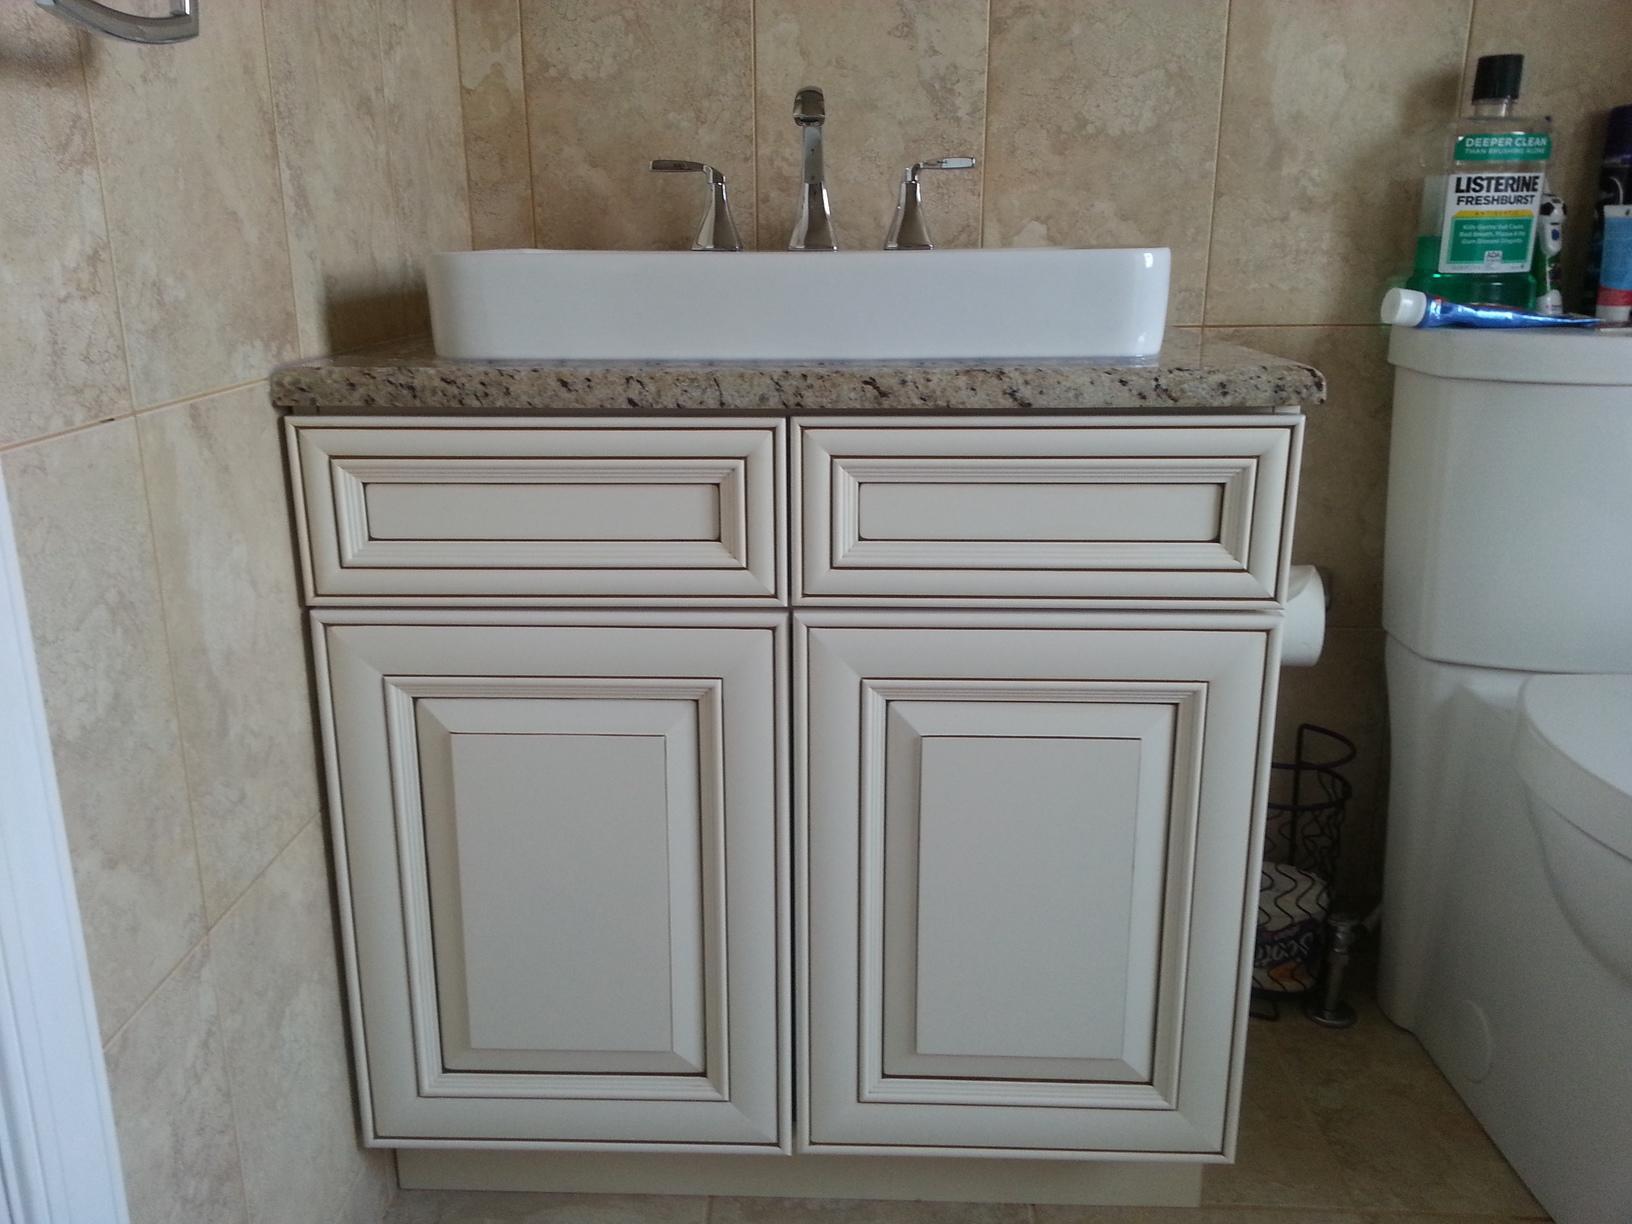 Installing New Bathroom Sink